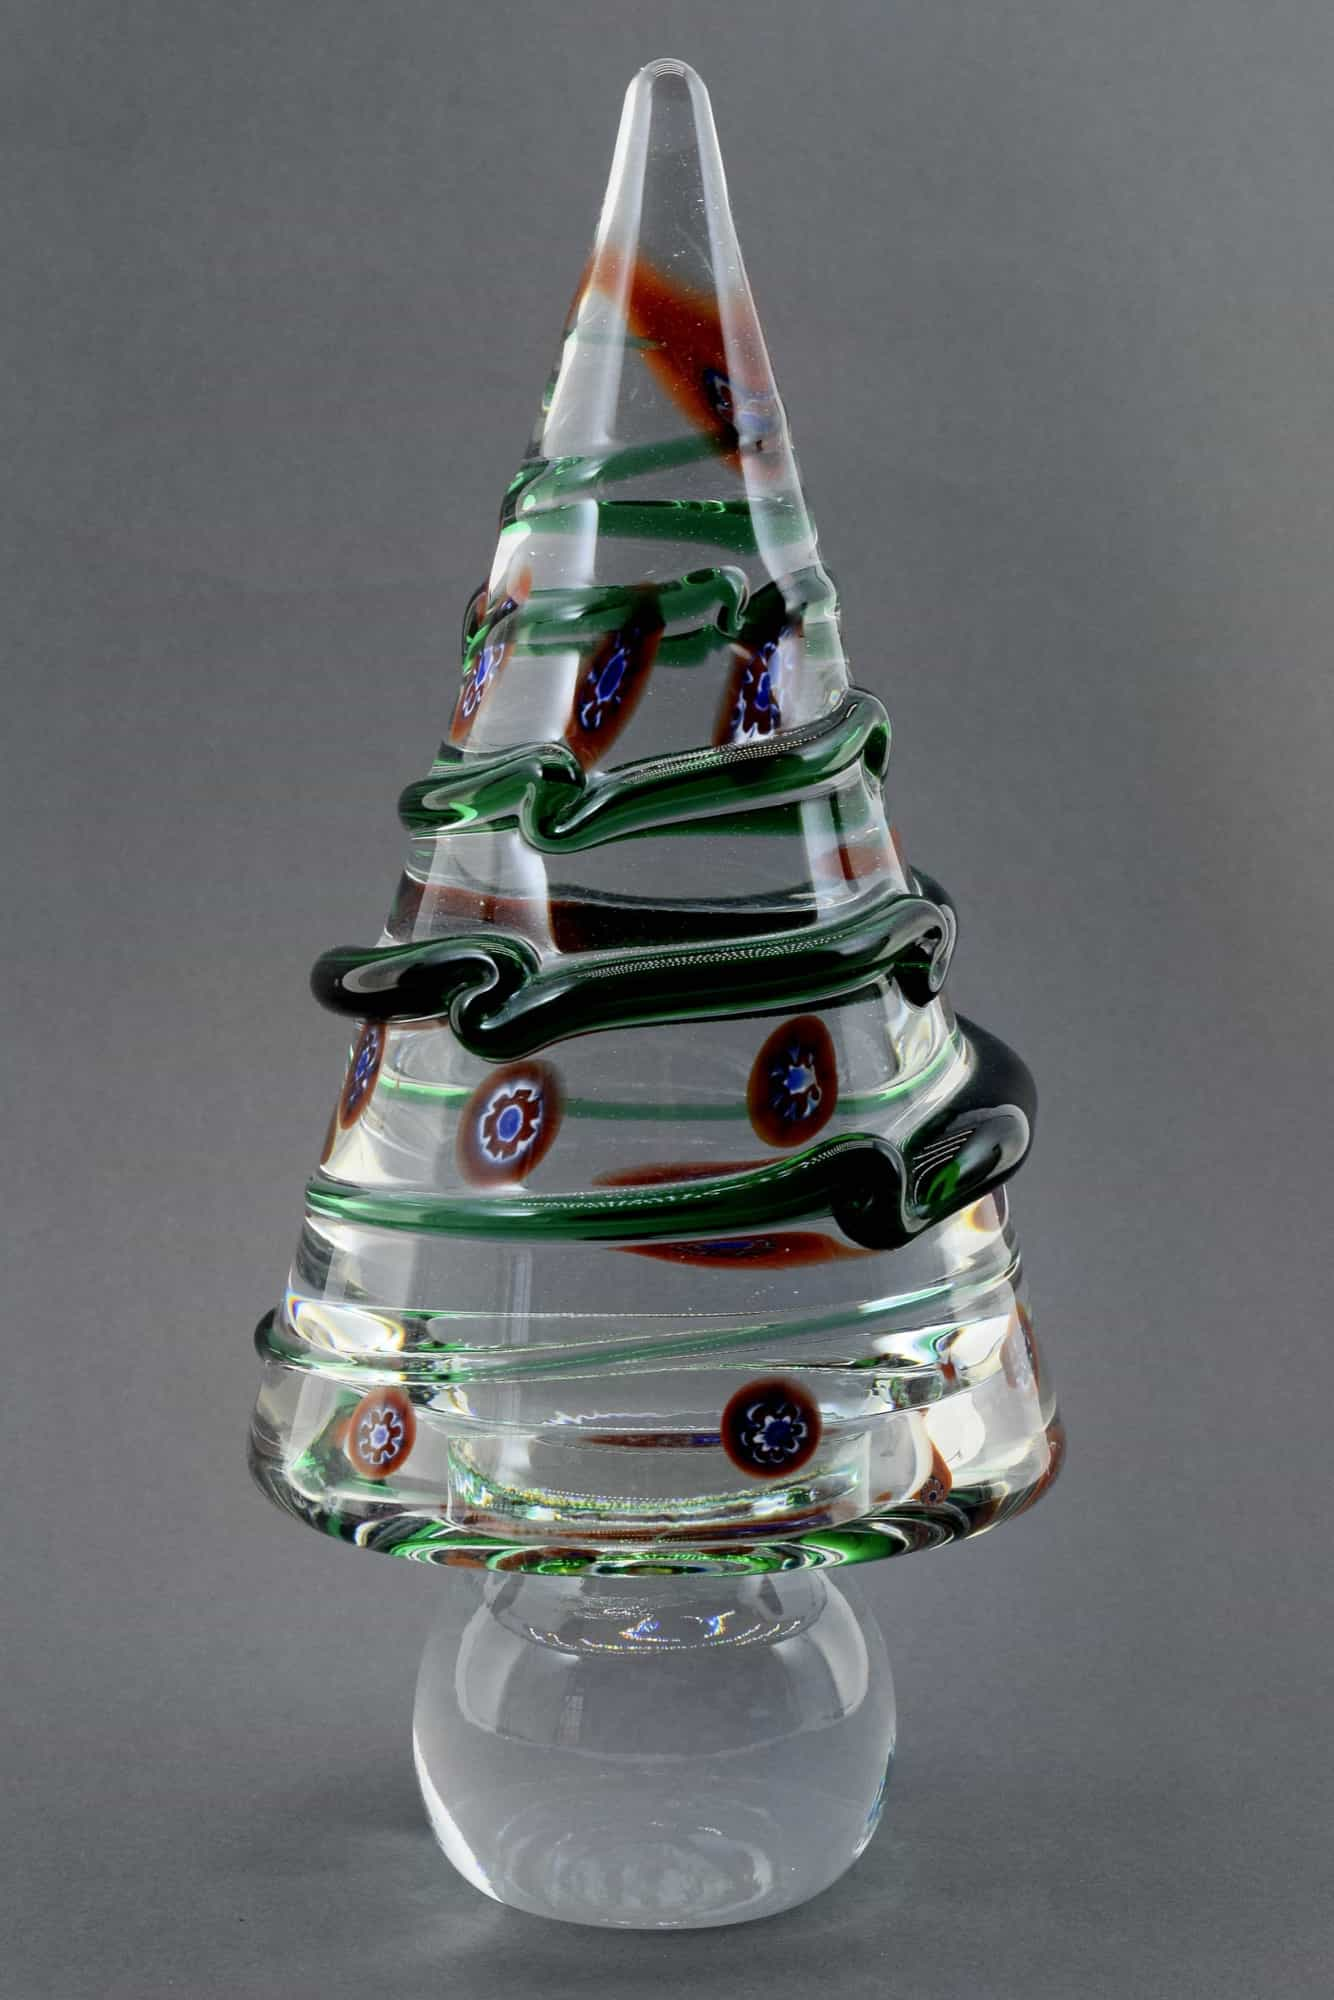 Murano Glas Weihnachtsbaum